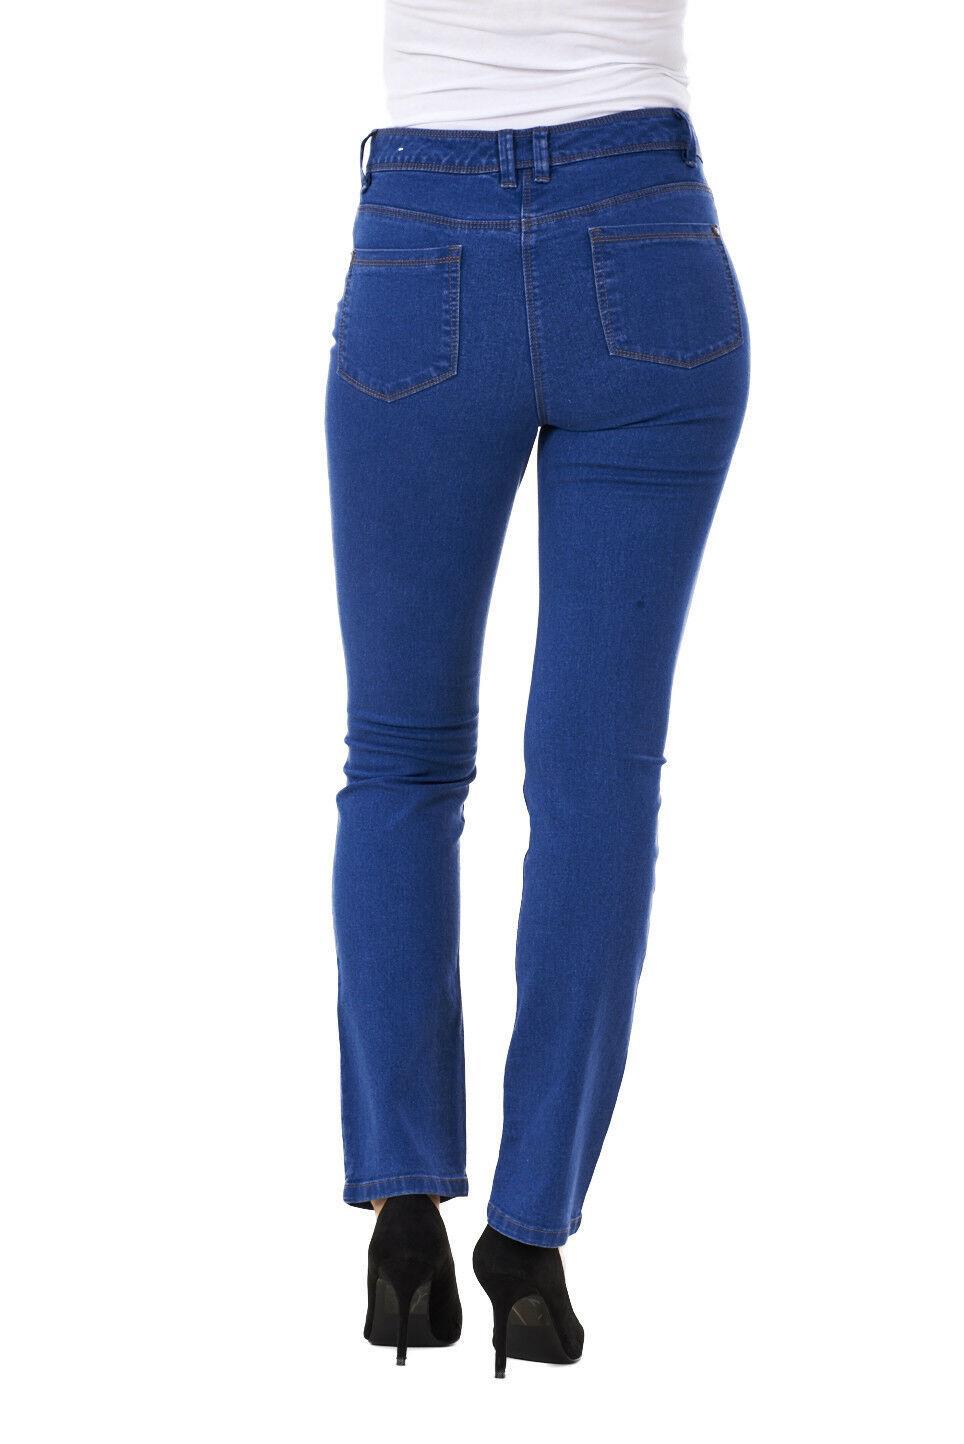 Ladies-Straight-Leg-Denim-Womens-Pants-Stretch-Regular-Fit-Jeans thumbnail 12